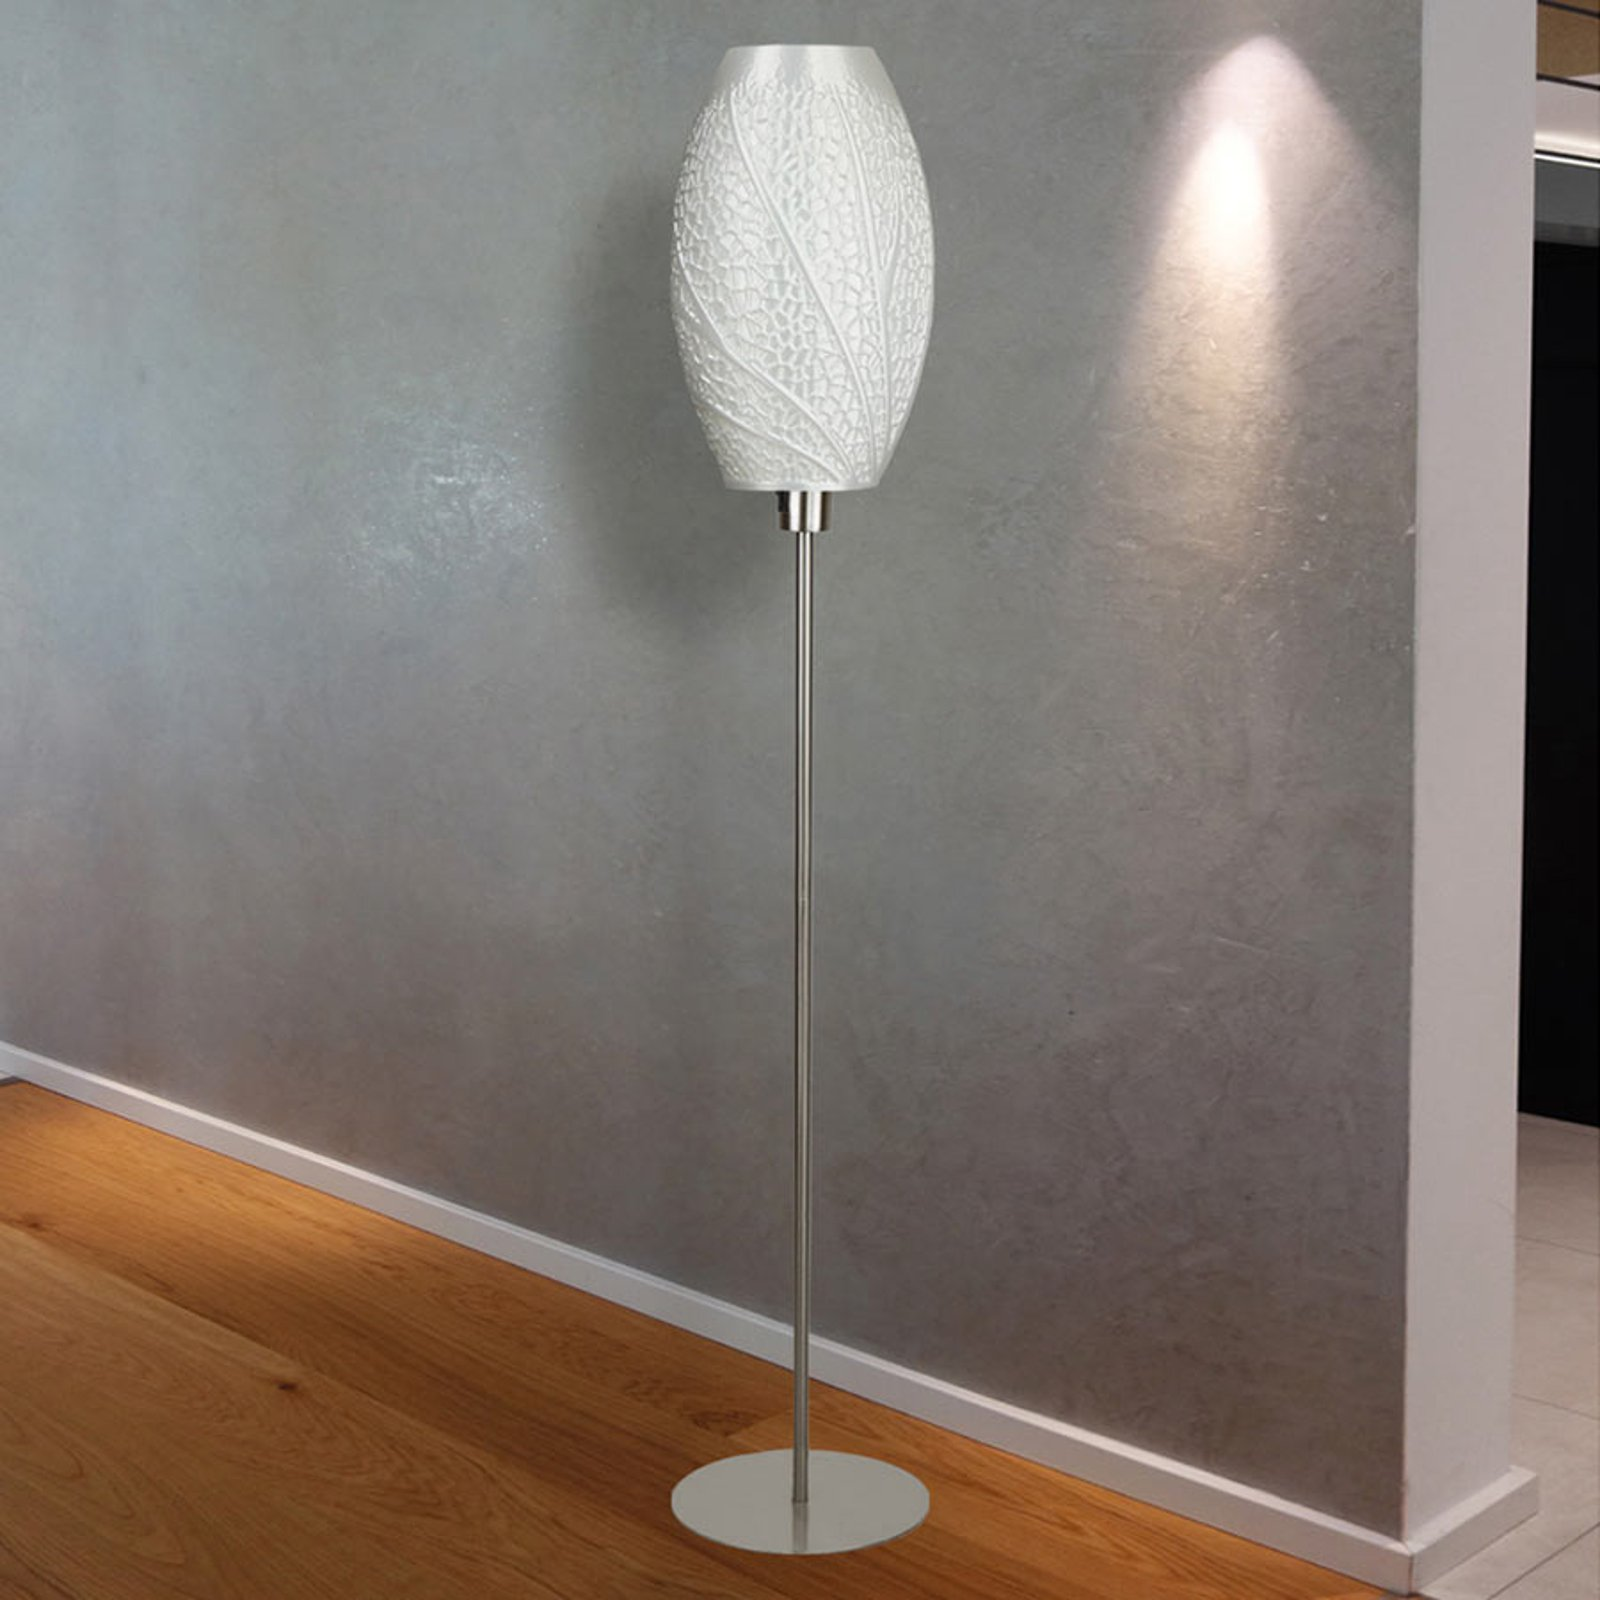 Designer-gulvlampe Flora, 3D-trykk